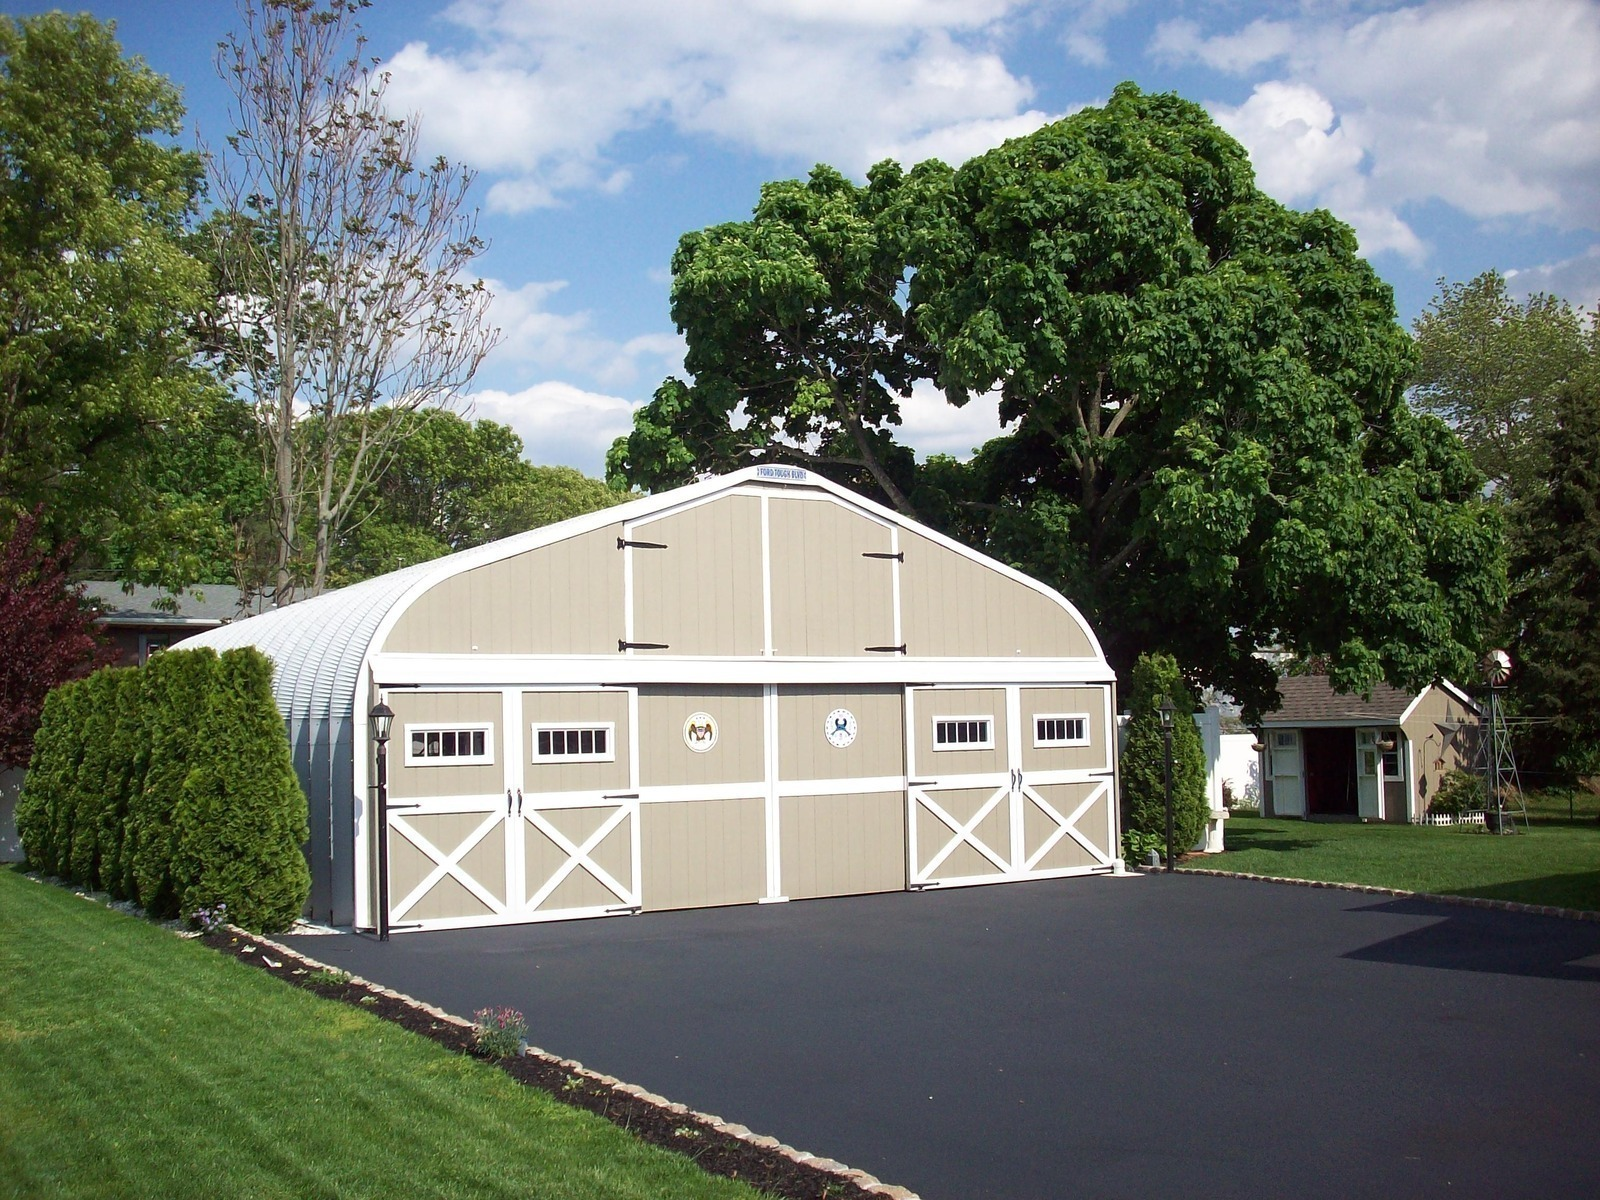 Metal garage kits diy kits to build your steel garage subscribe to steelmaster news solutioingenieria Choice Image